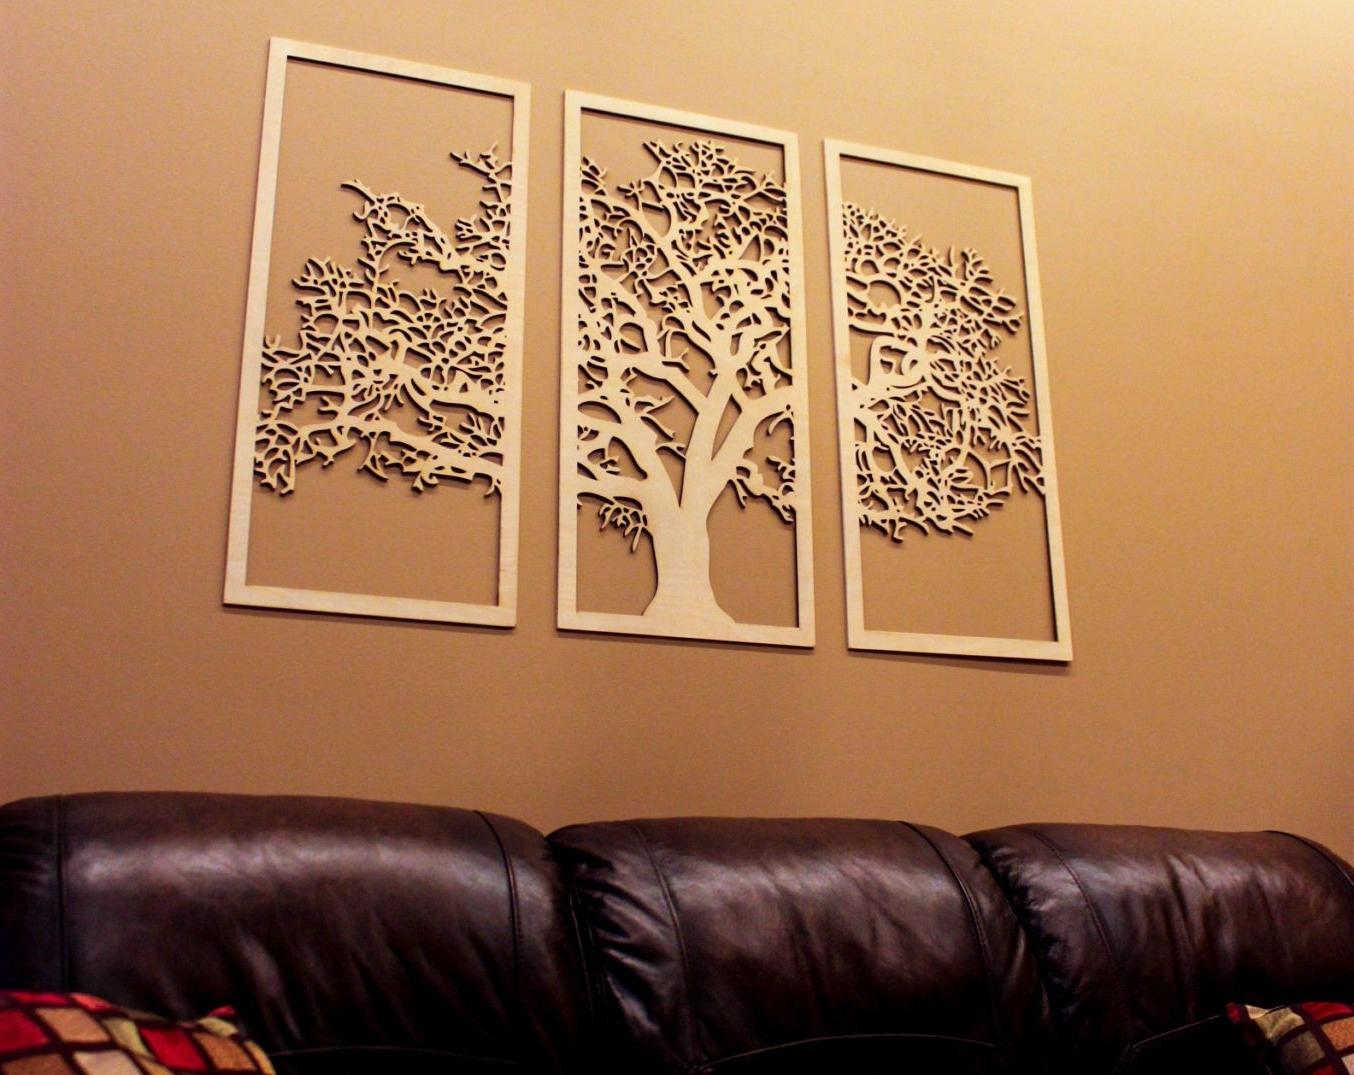 3d Tree, Wood Wall Art And Wood Walls (View 12 of 15)